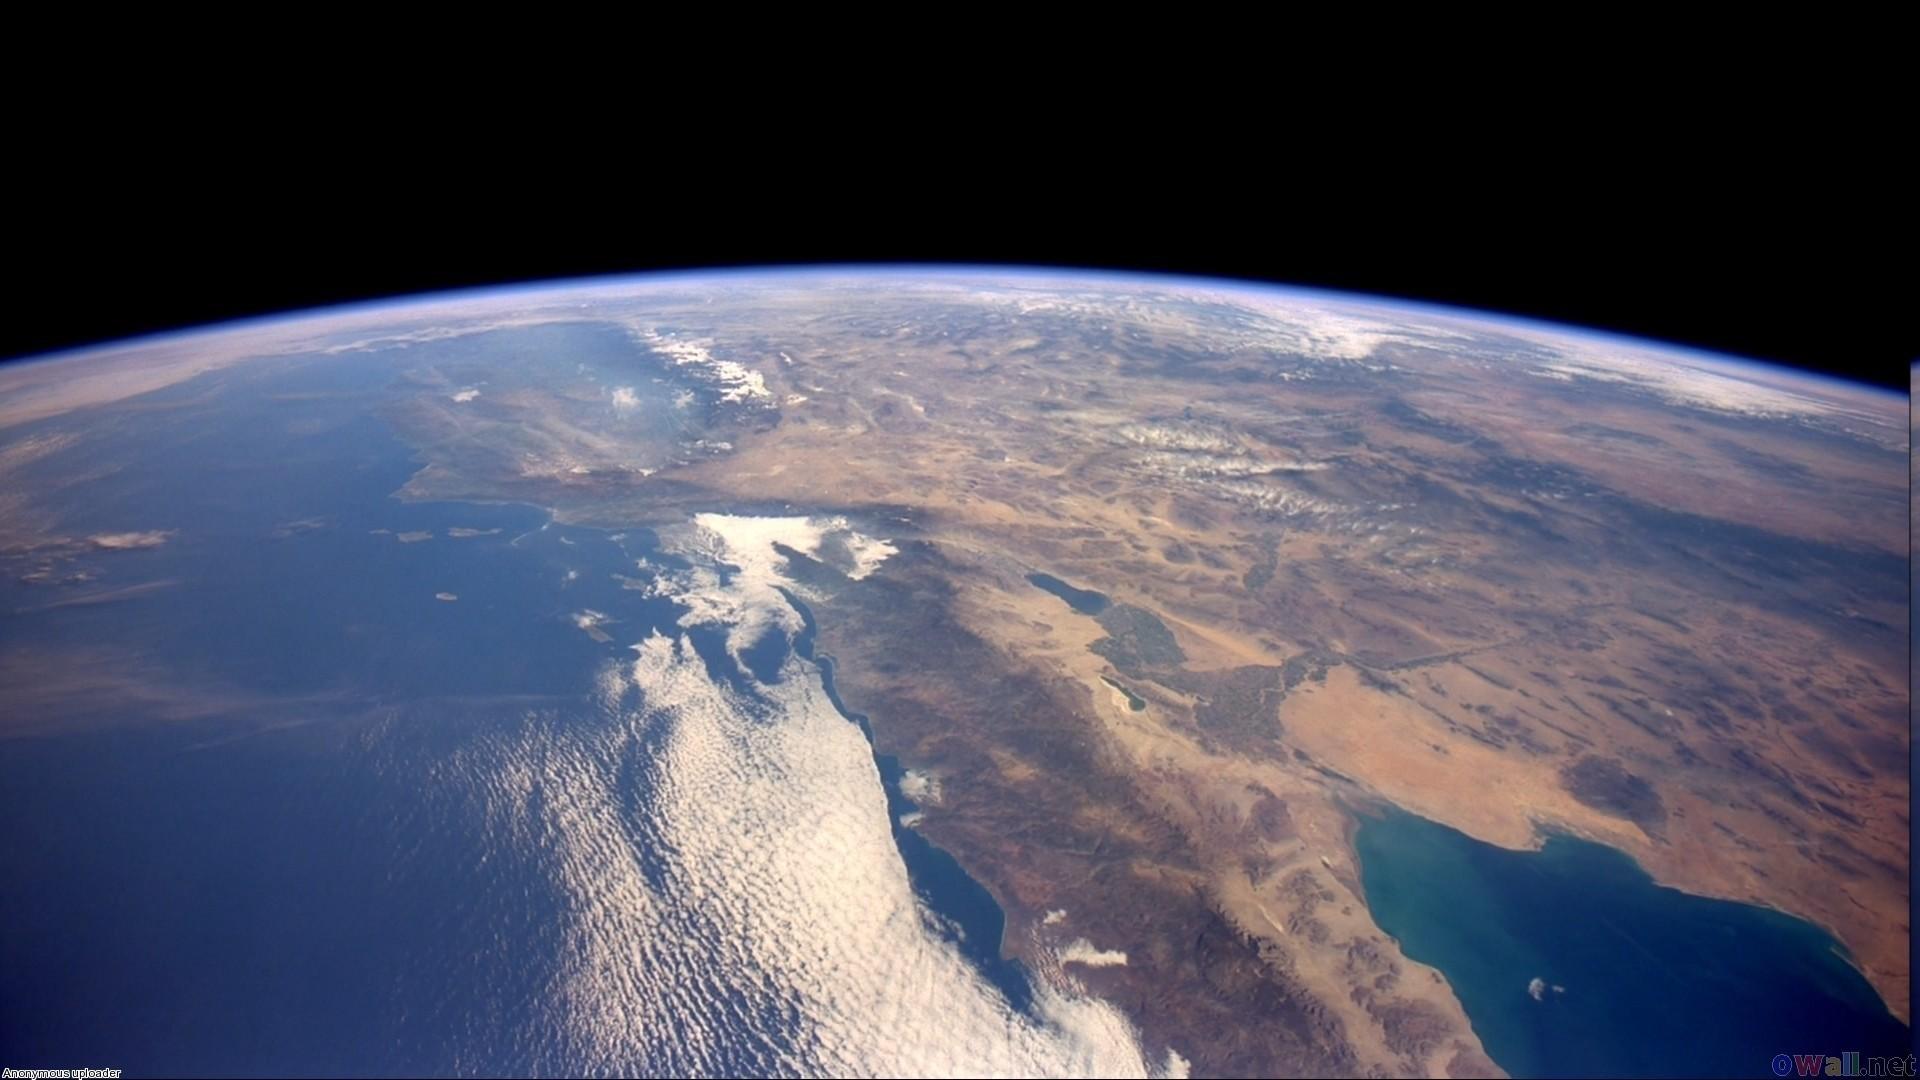 HD Earth Desktop Wallpaper (73+ Images